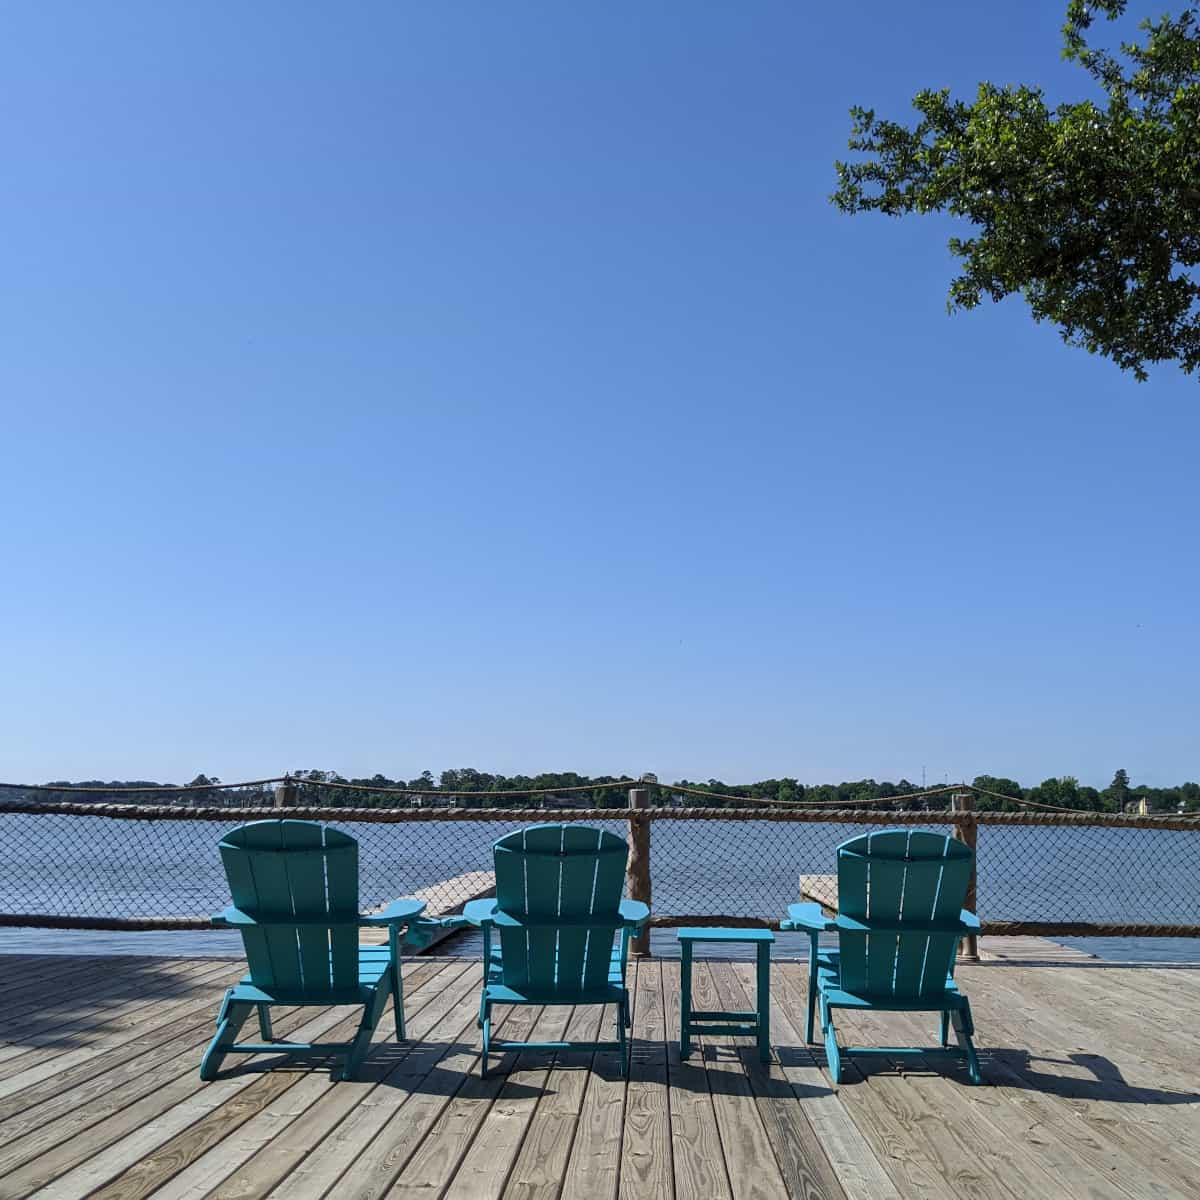 Chairs on Lake Conroe